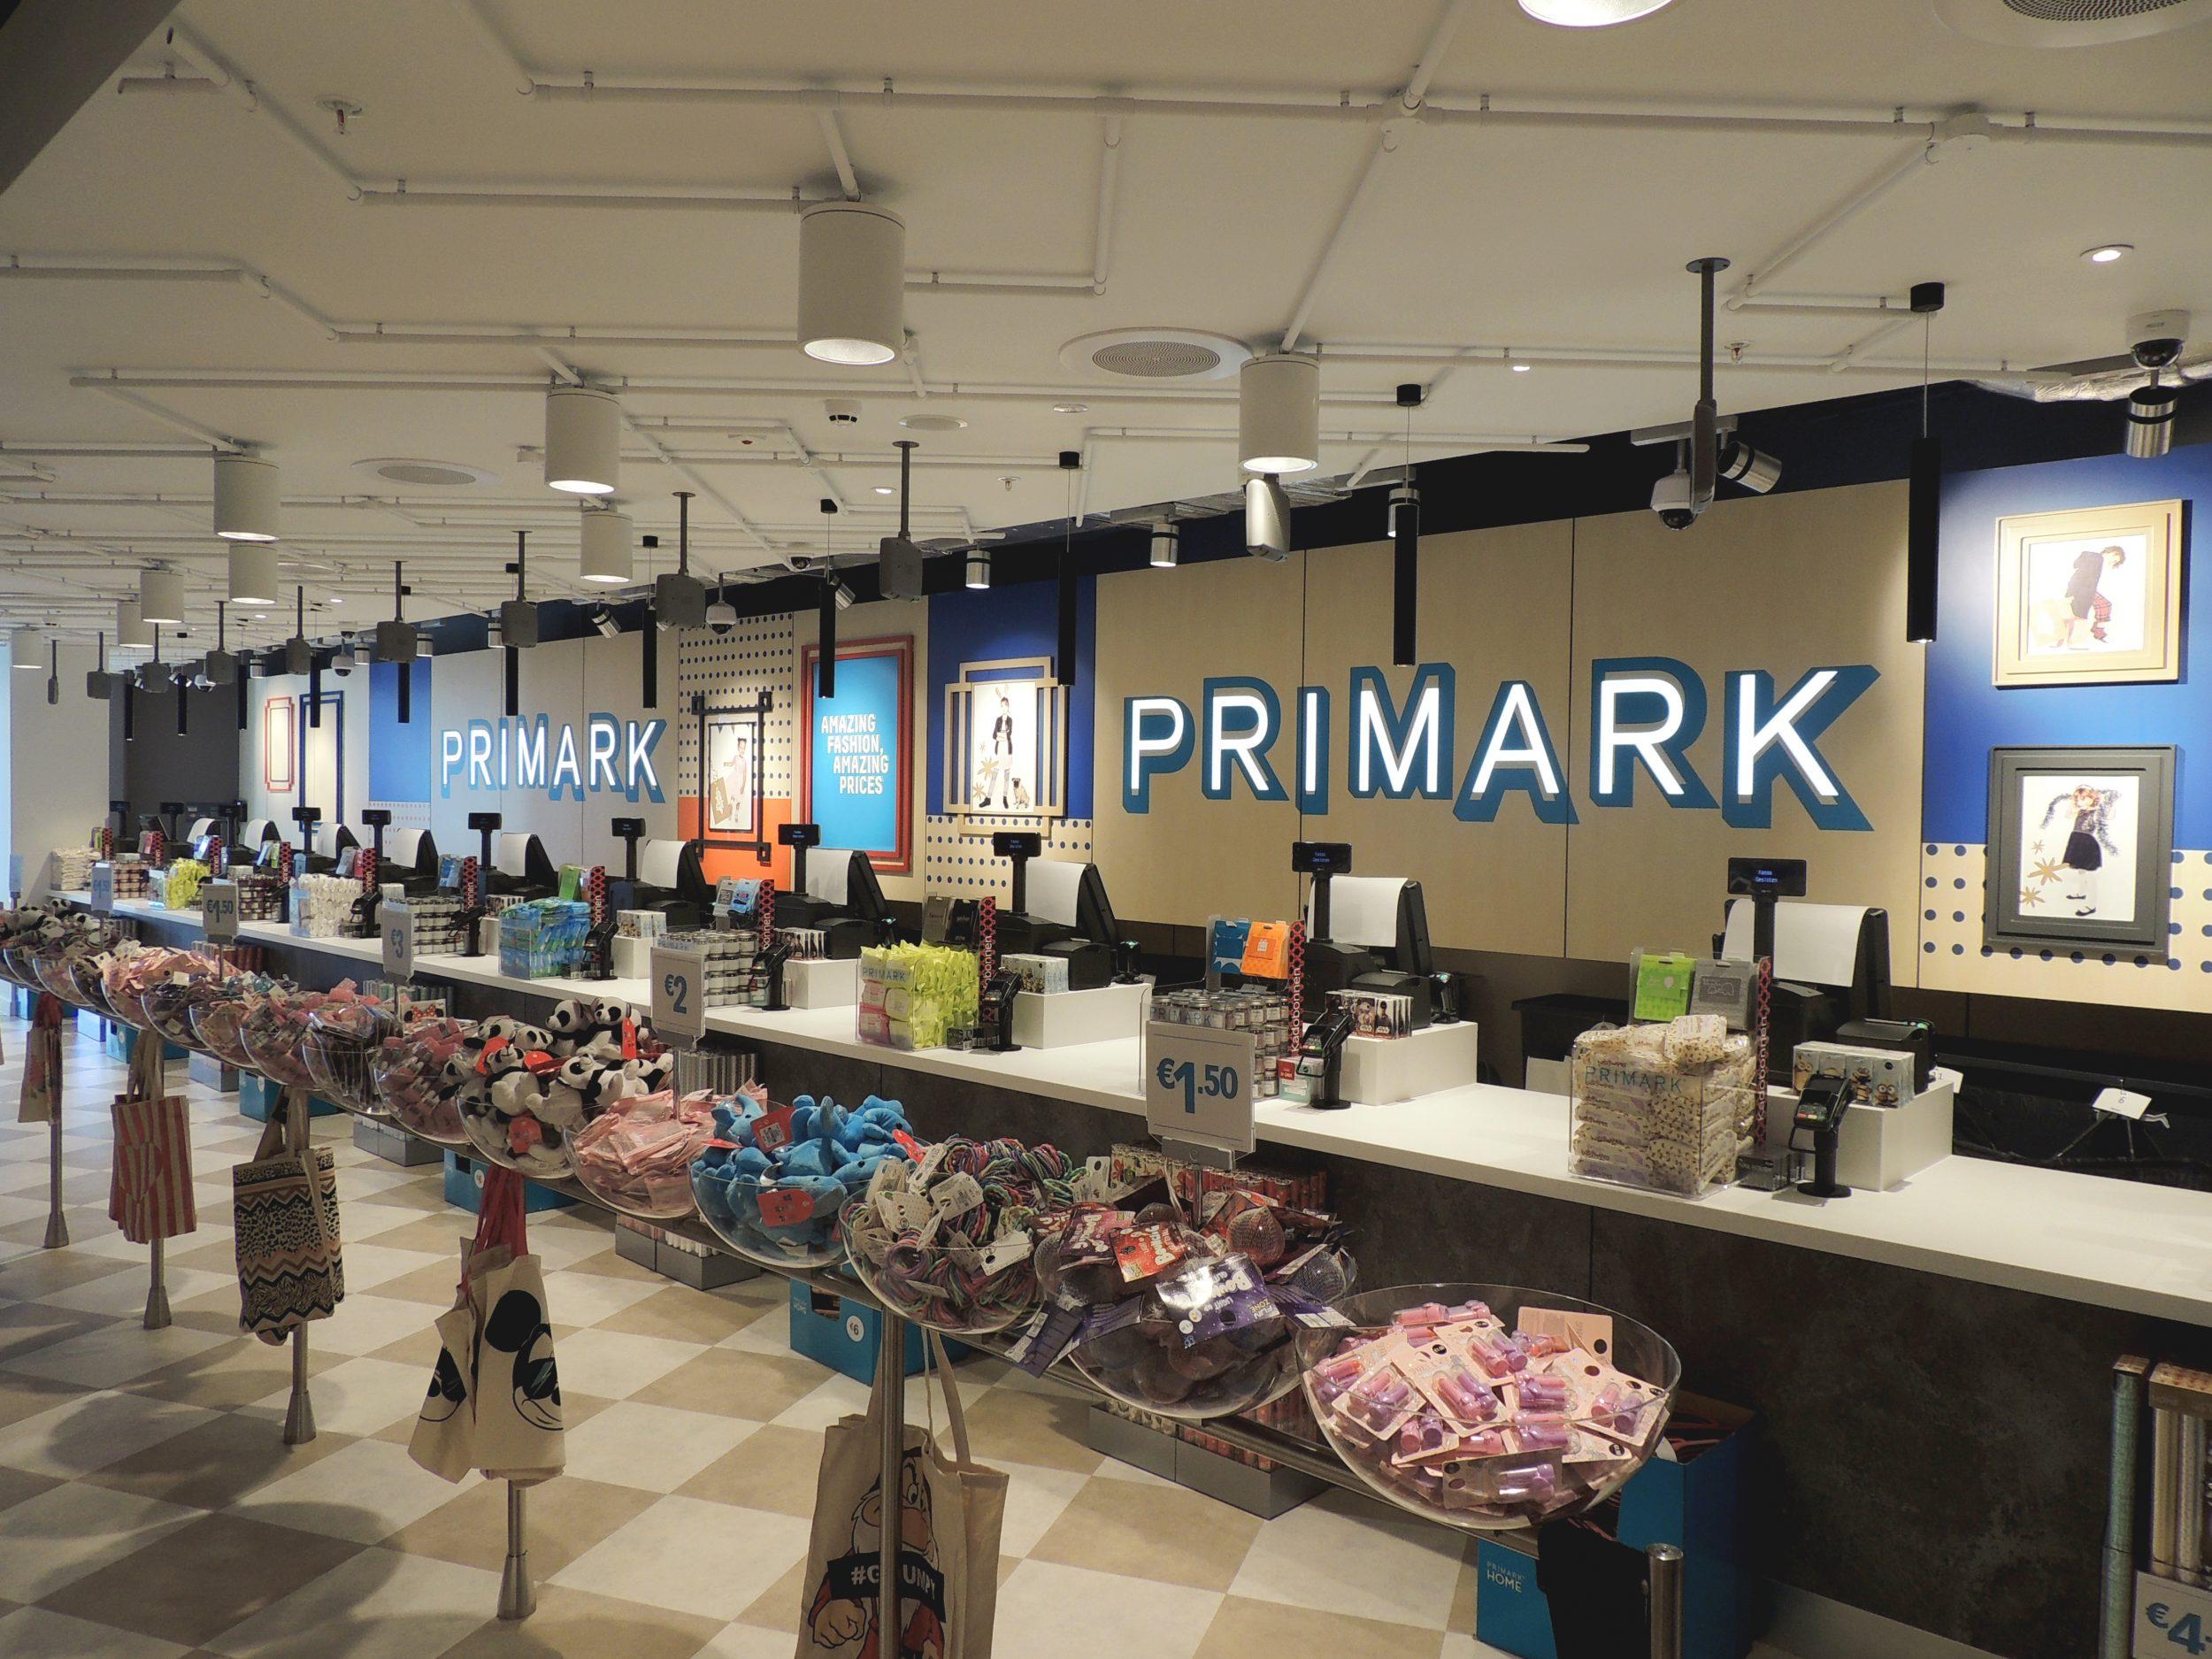 primark - photo #23